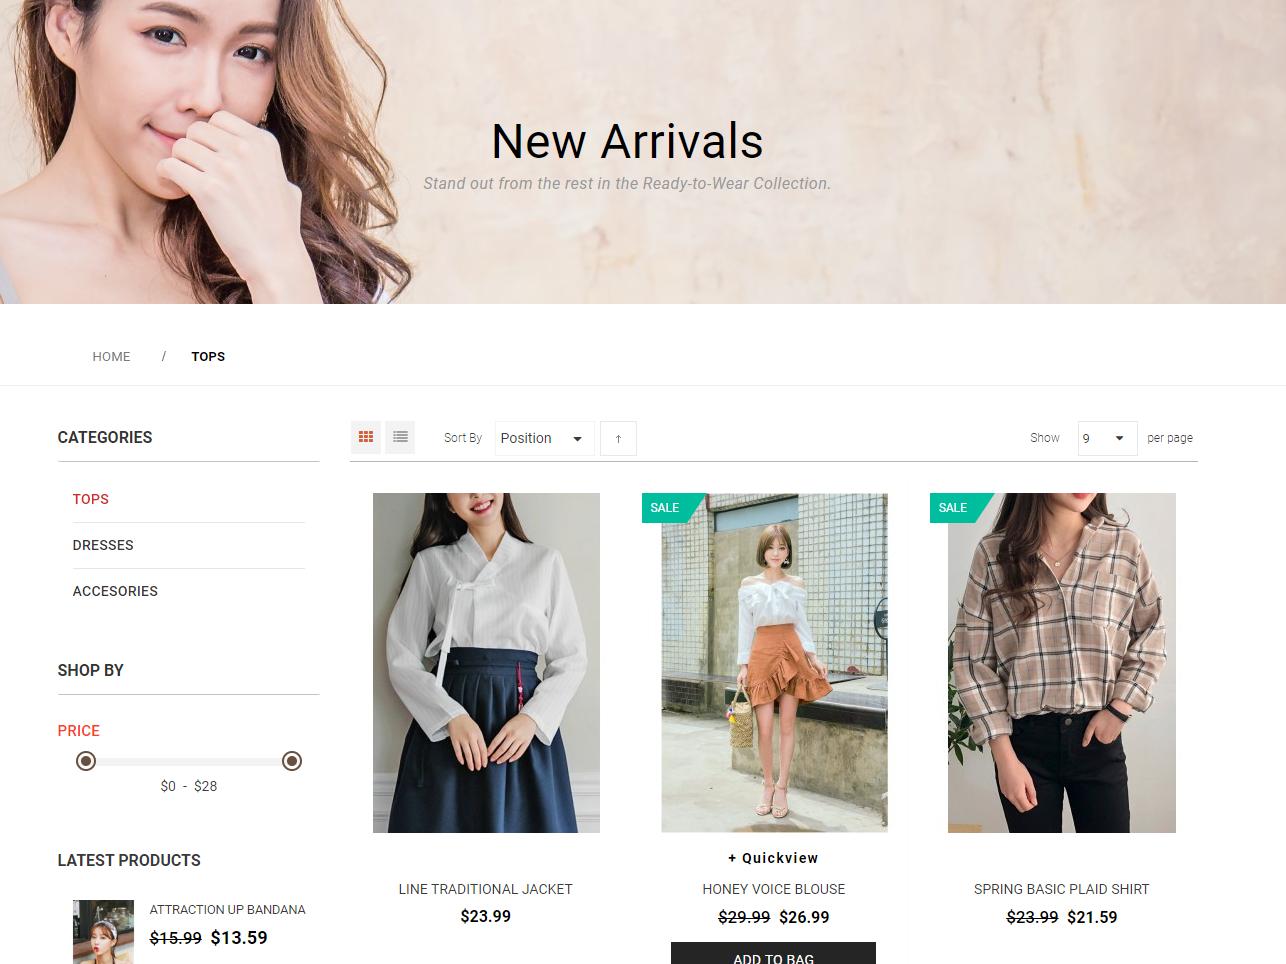 Gliize為香港外銷韓國服裝網店,後台採用Magento 2系統開發。